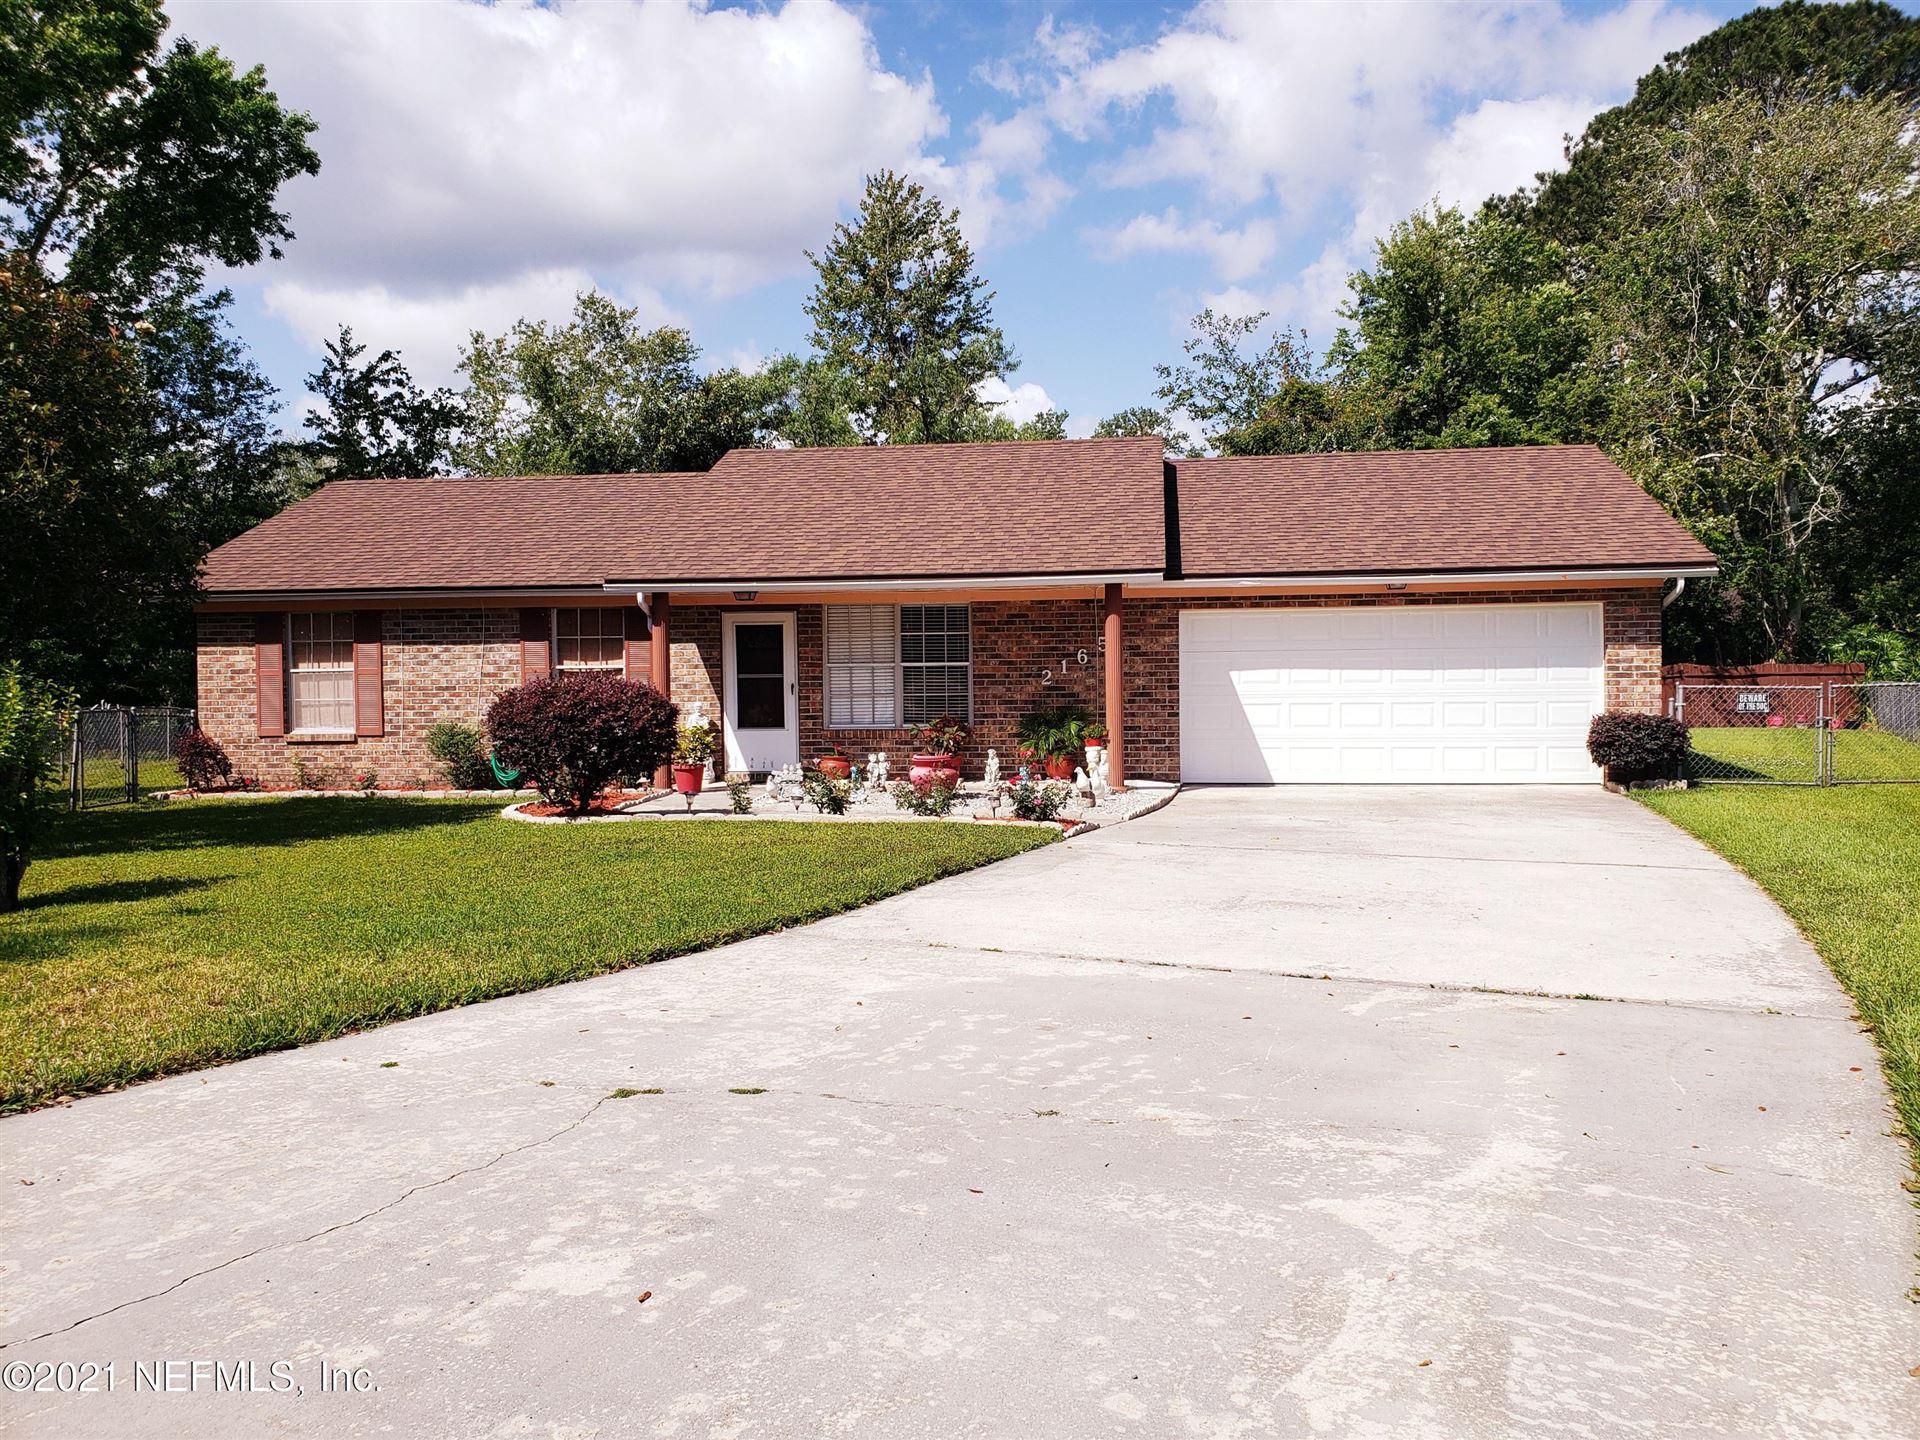 2165 AGAVE MANOR #Lot No: 25, Middleburg, FL 32068 - MLS#: 1108979